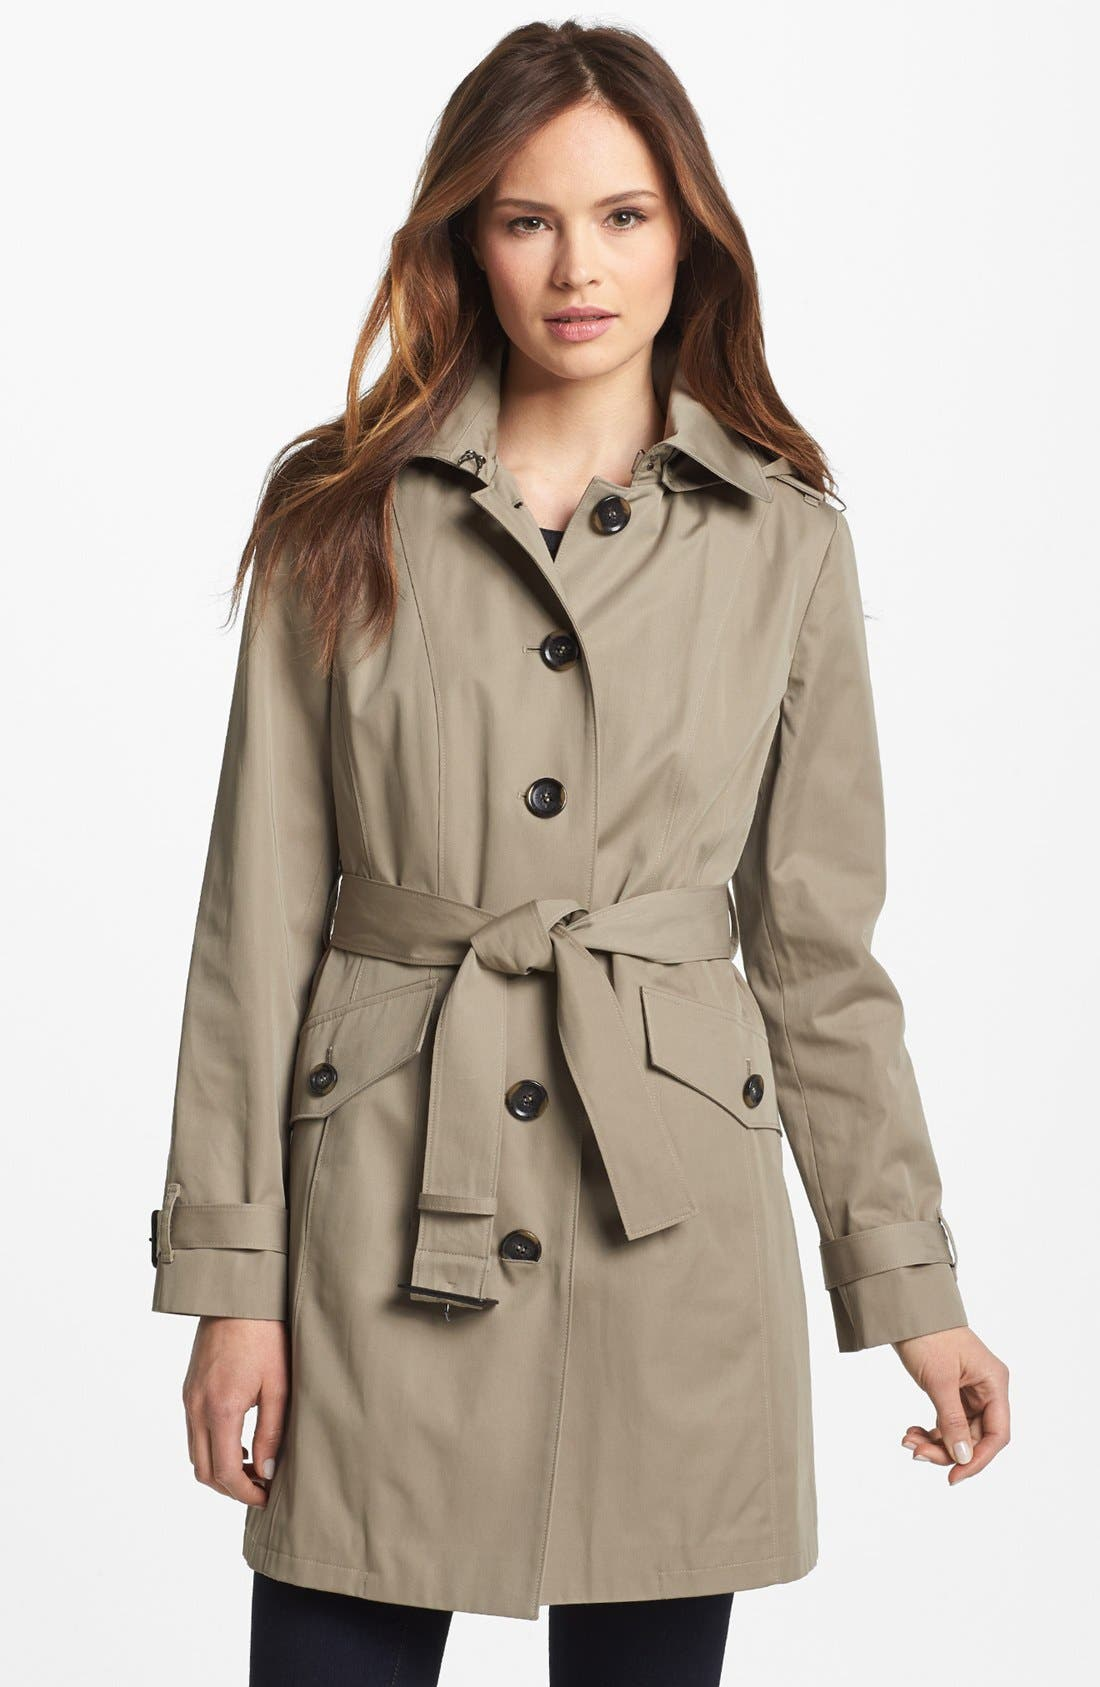 Main Image - MICHAEL Michael Kors Trench Coat with Detachable Hood (Nordstrom Exclusive)